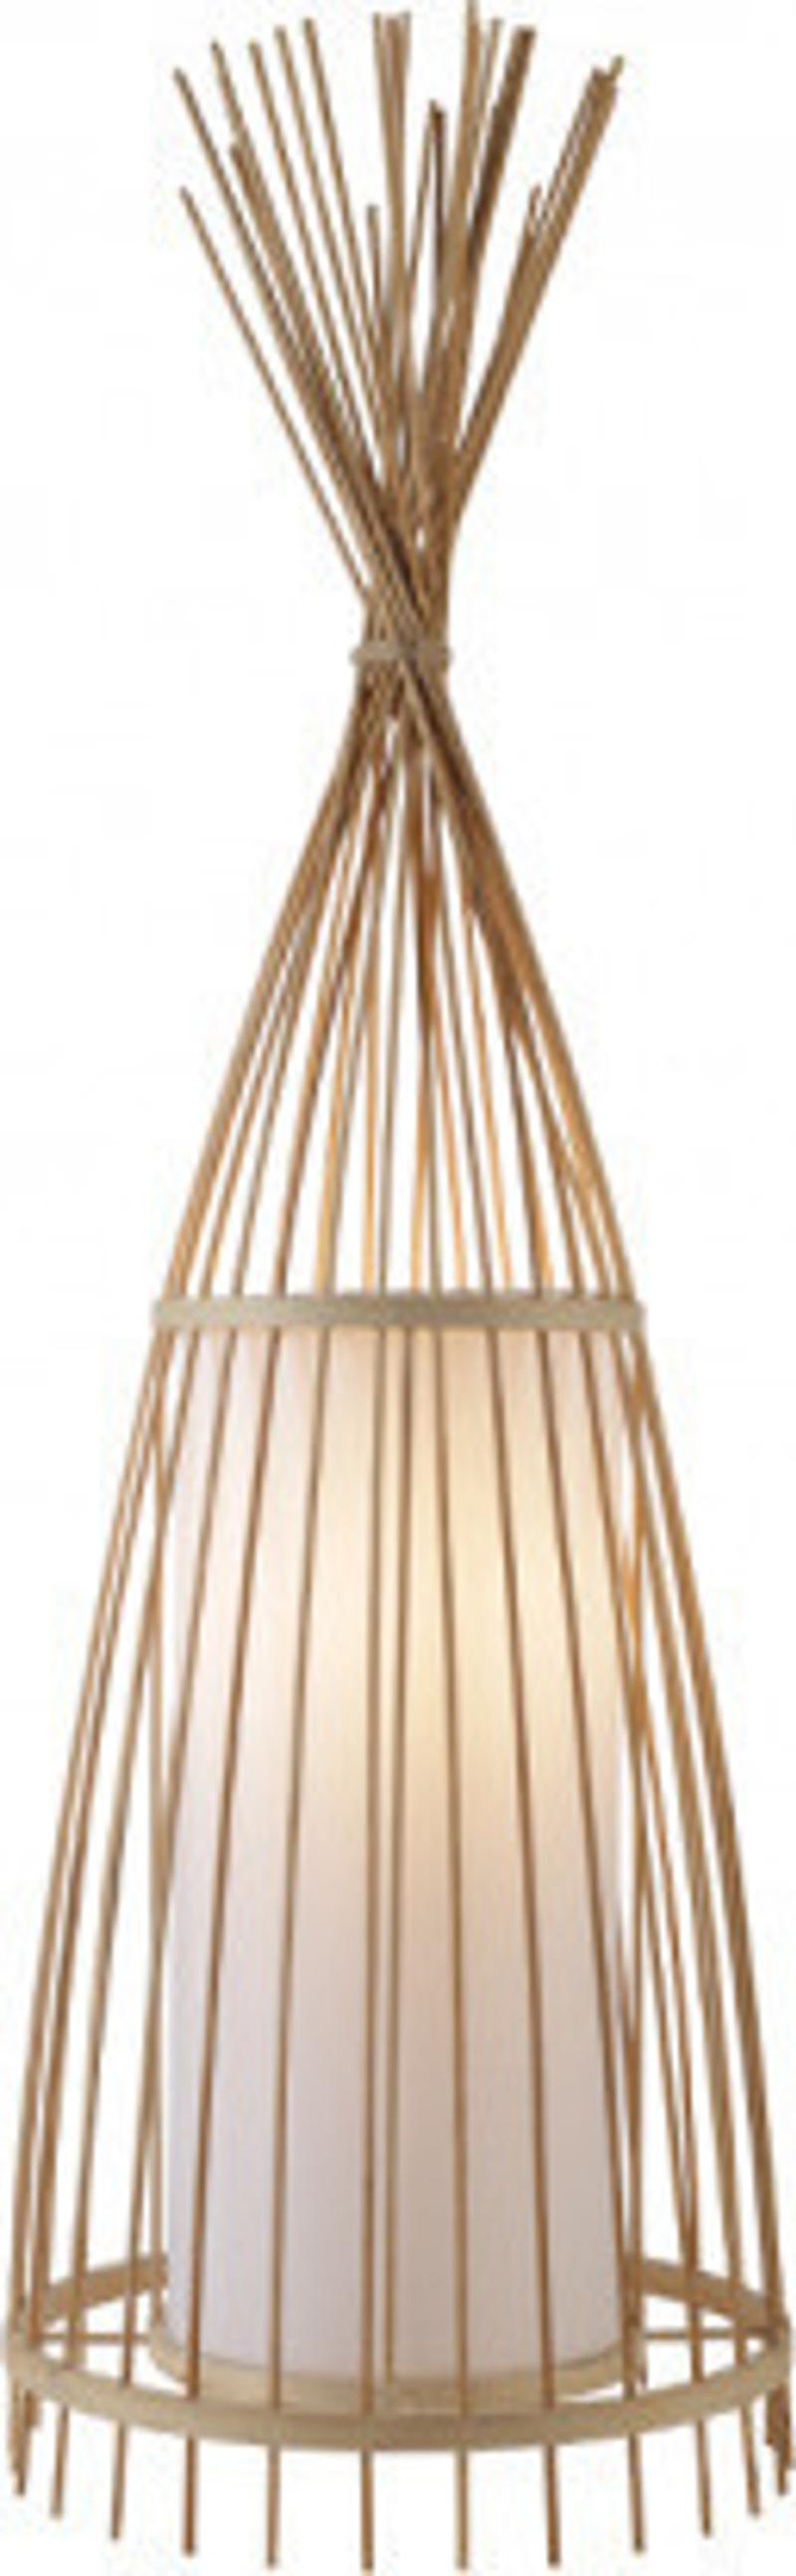 ACA Επιδαπέδιο Φωτιστικό Bamboo 'Serifos' Ε27 30Χ100cm TF661F100BO